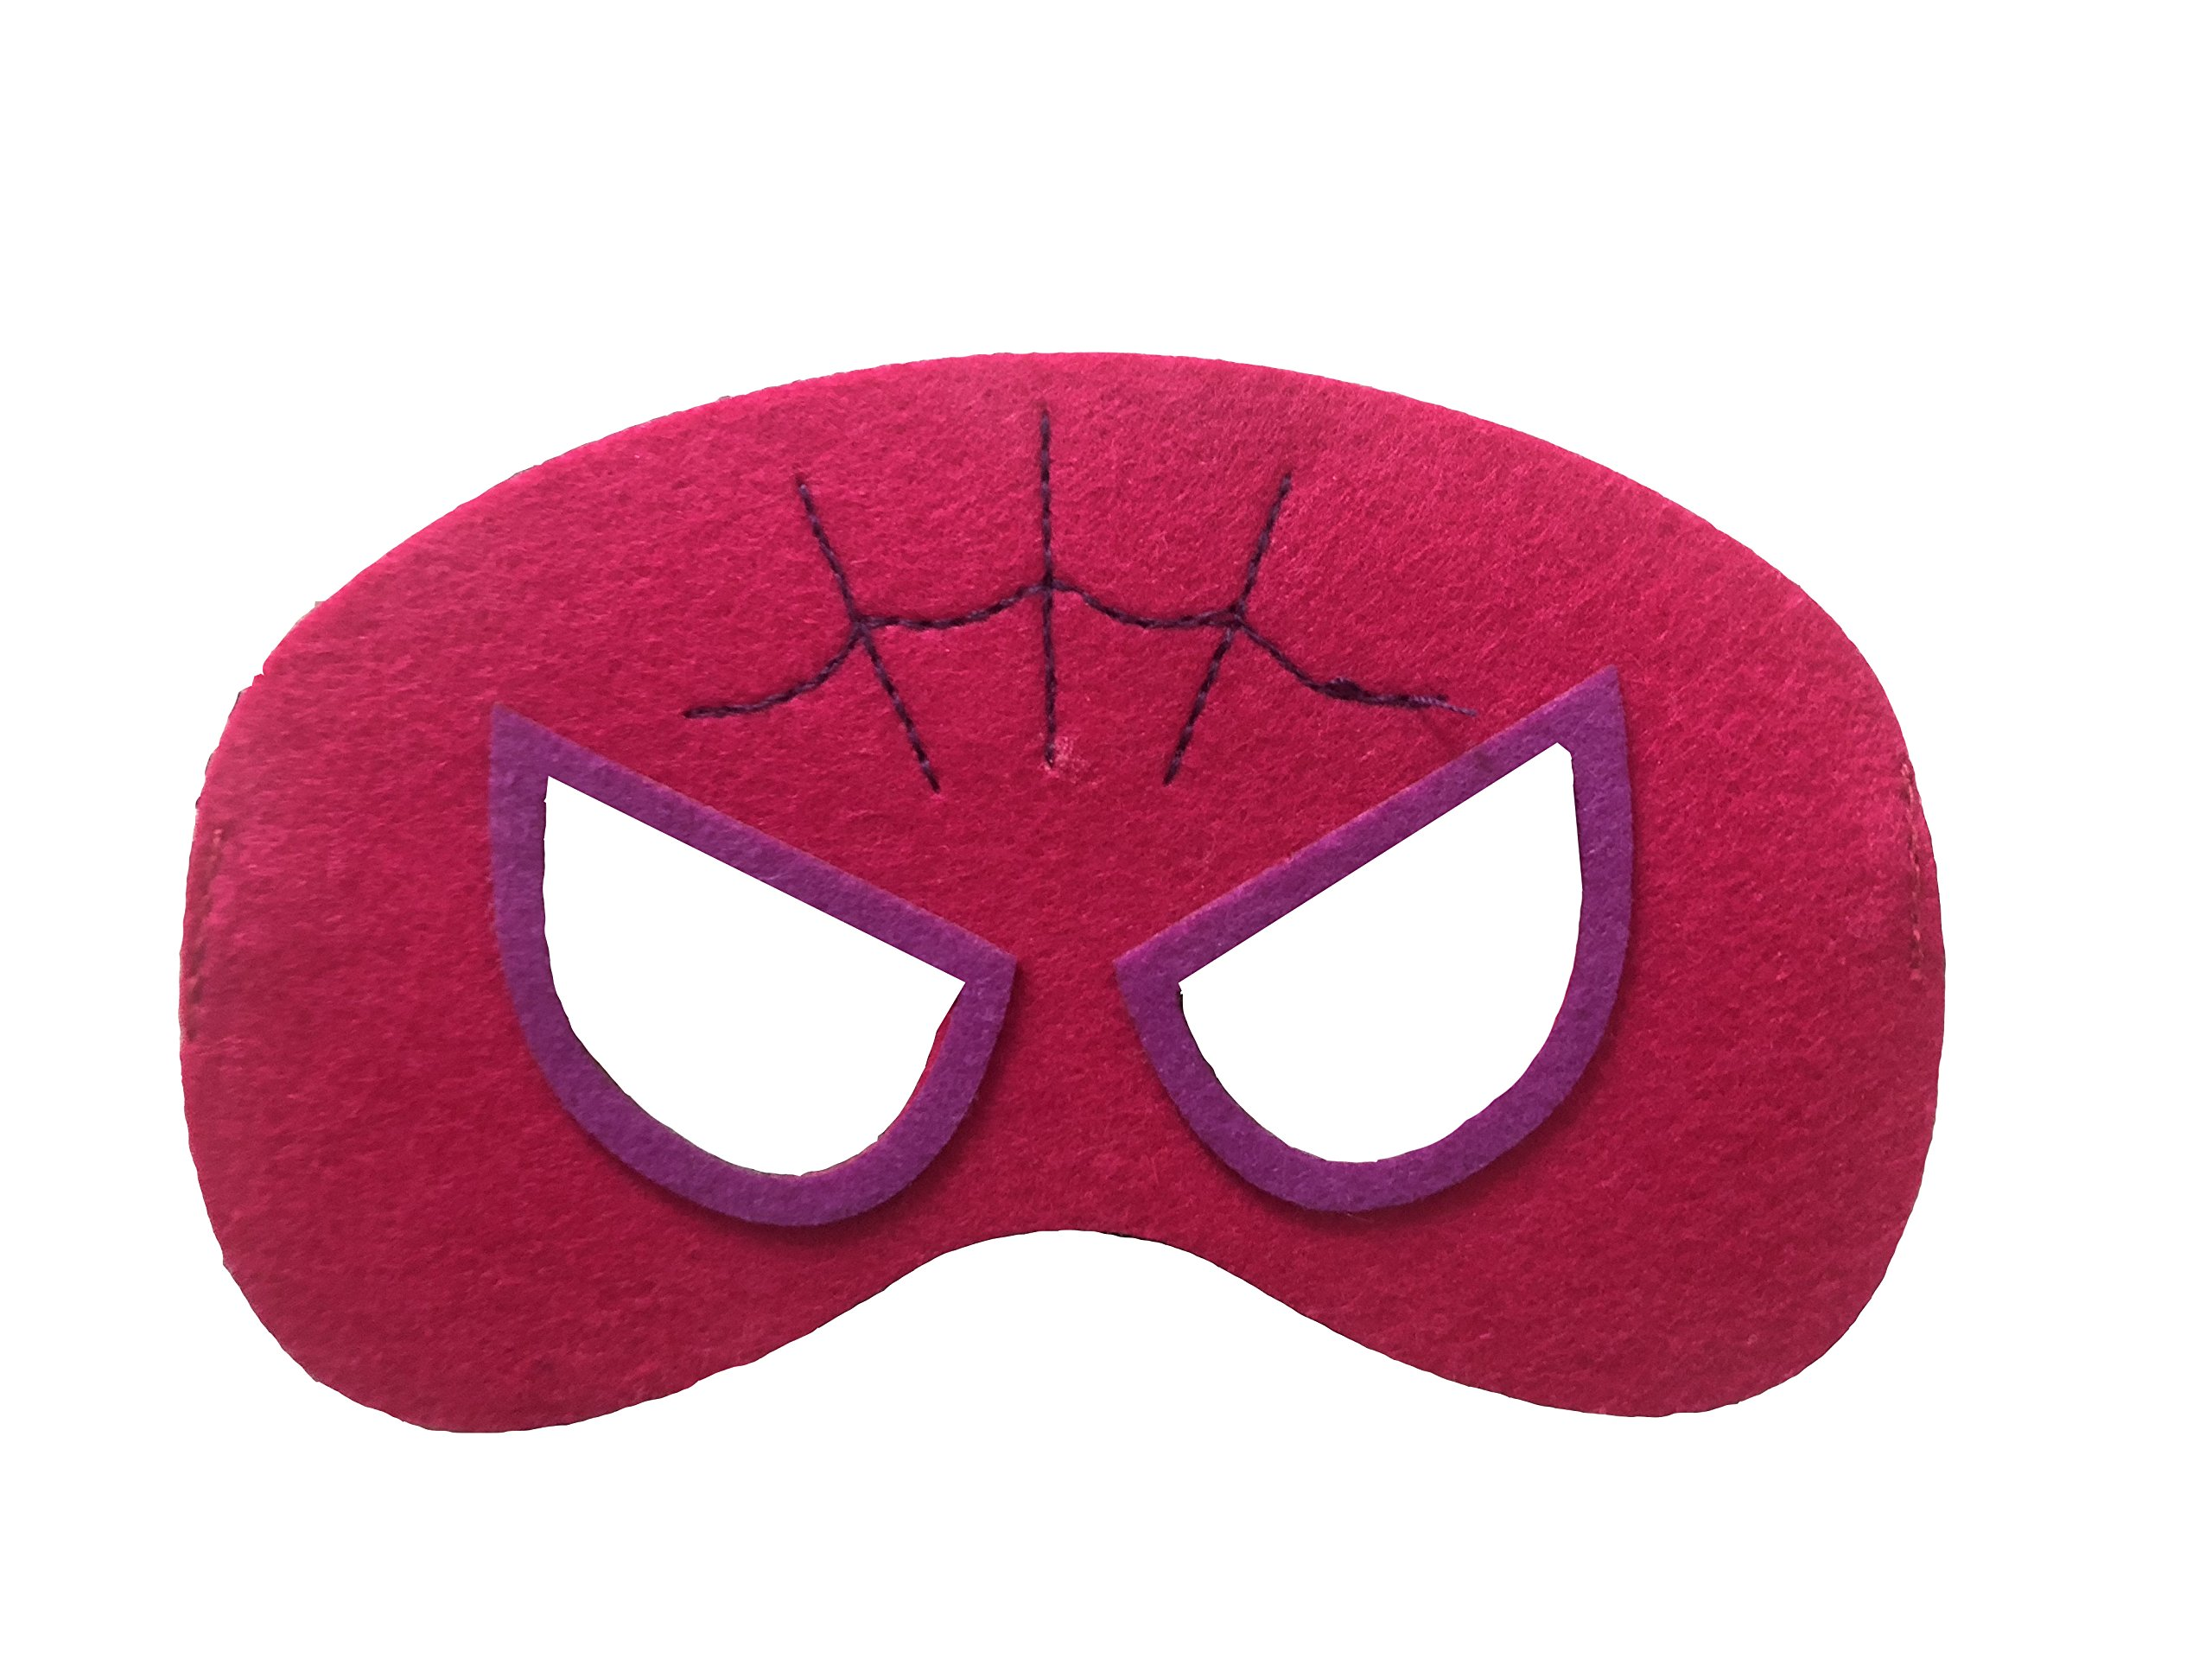 KAIIZAN Superhero Masks 33 Piece Plus 105 Stickers, Eye Masks, Birthday Supplies by KAIIZAN (Image #5)